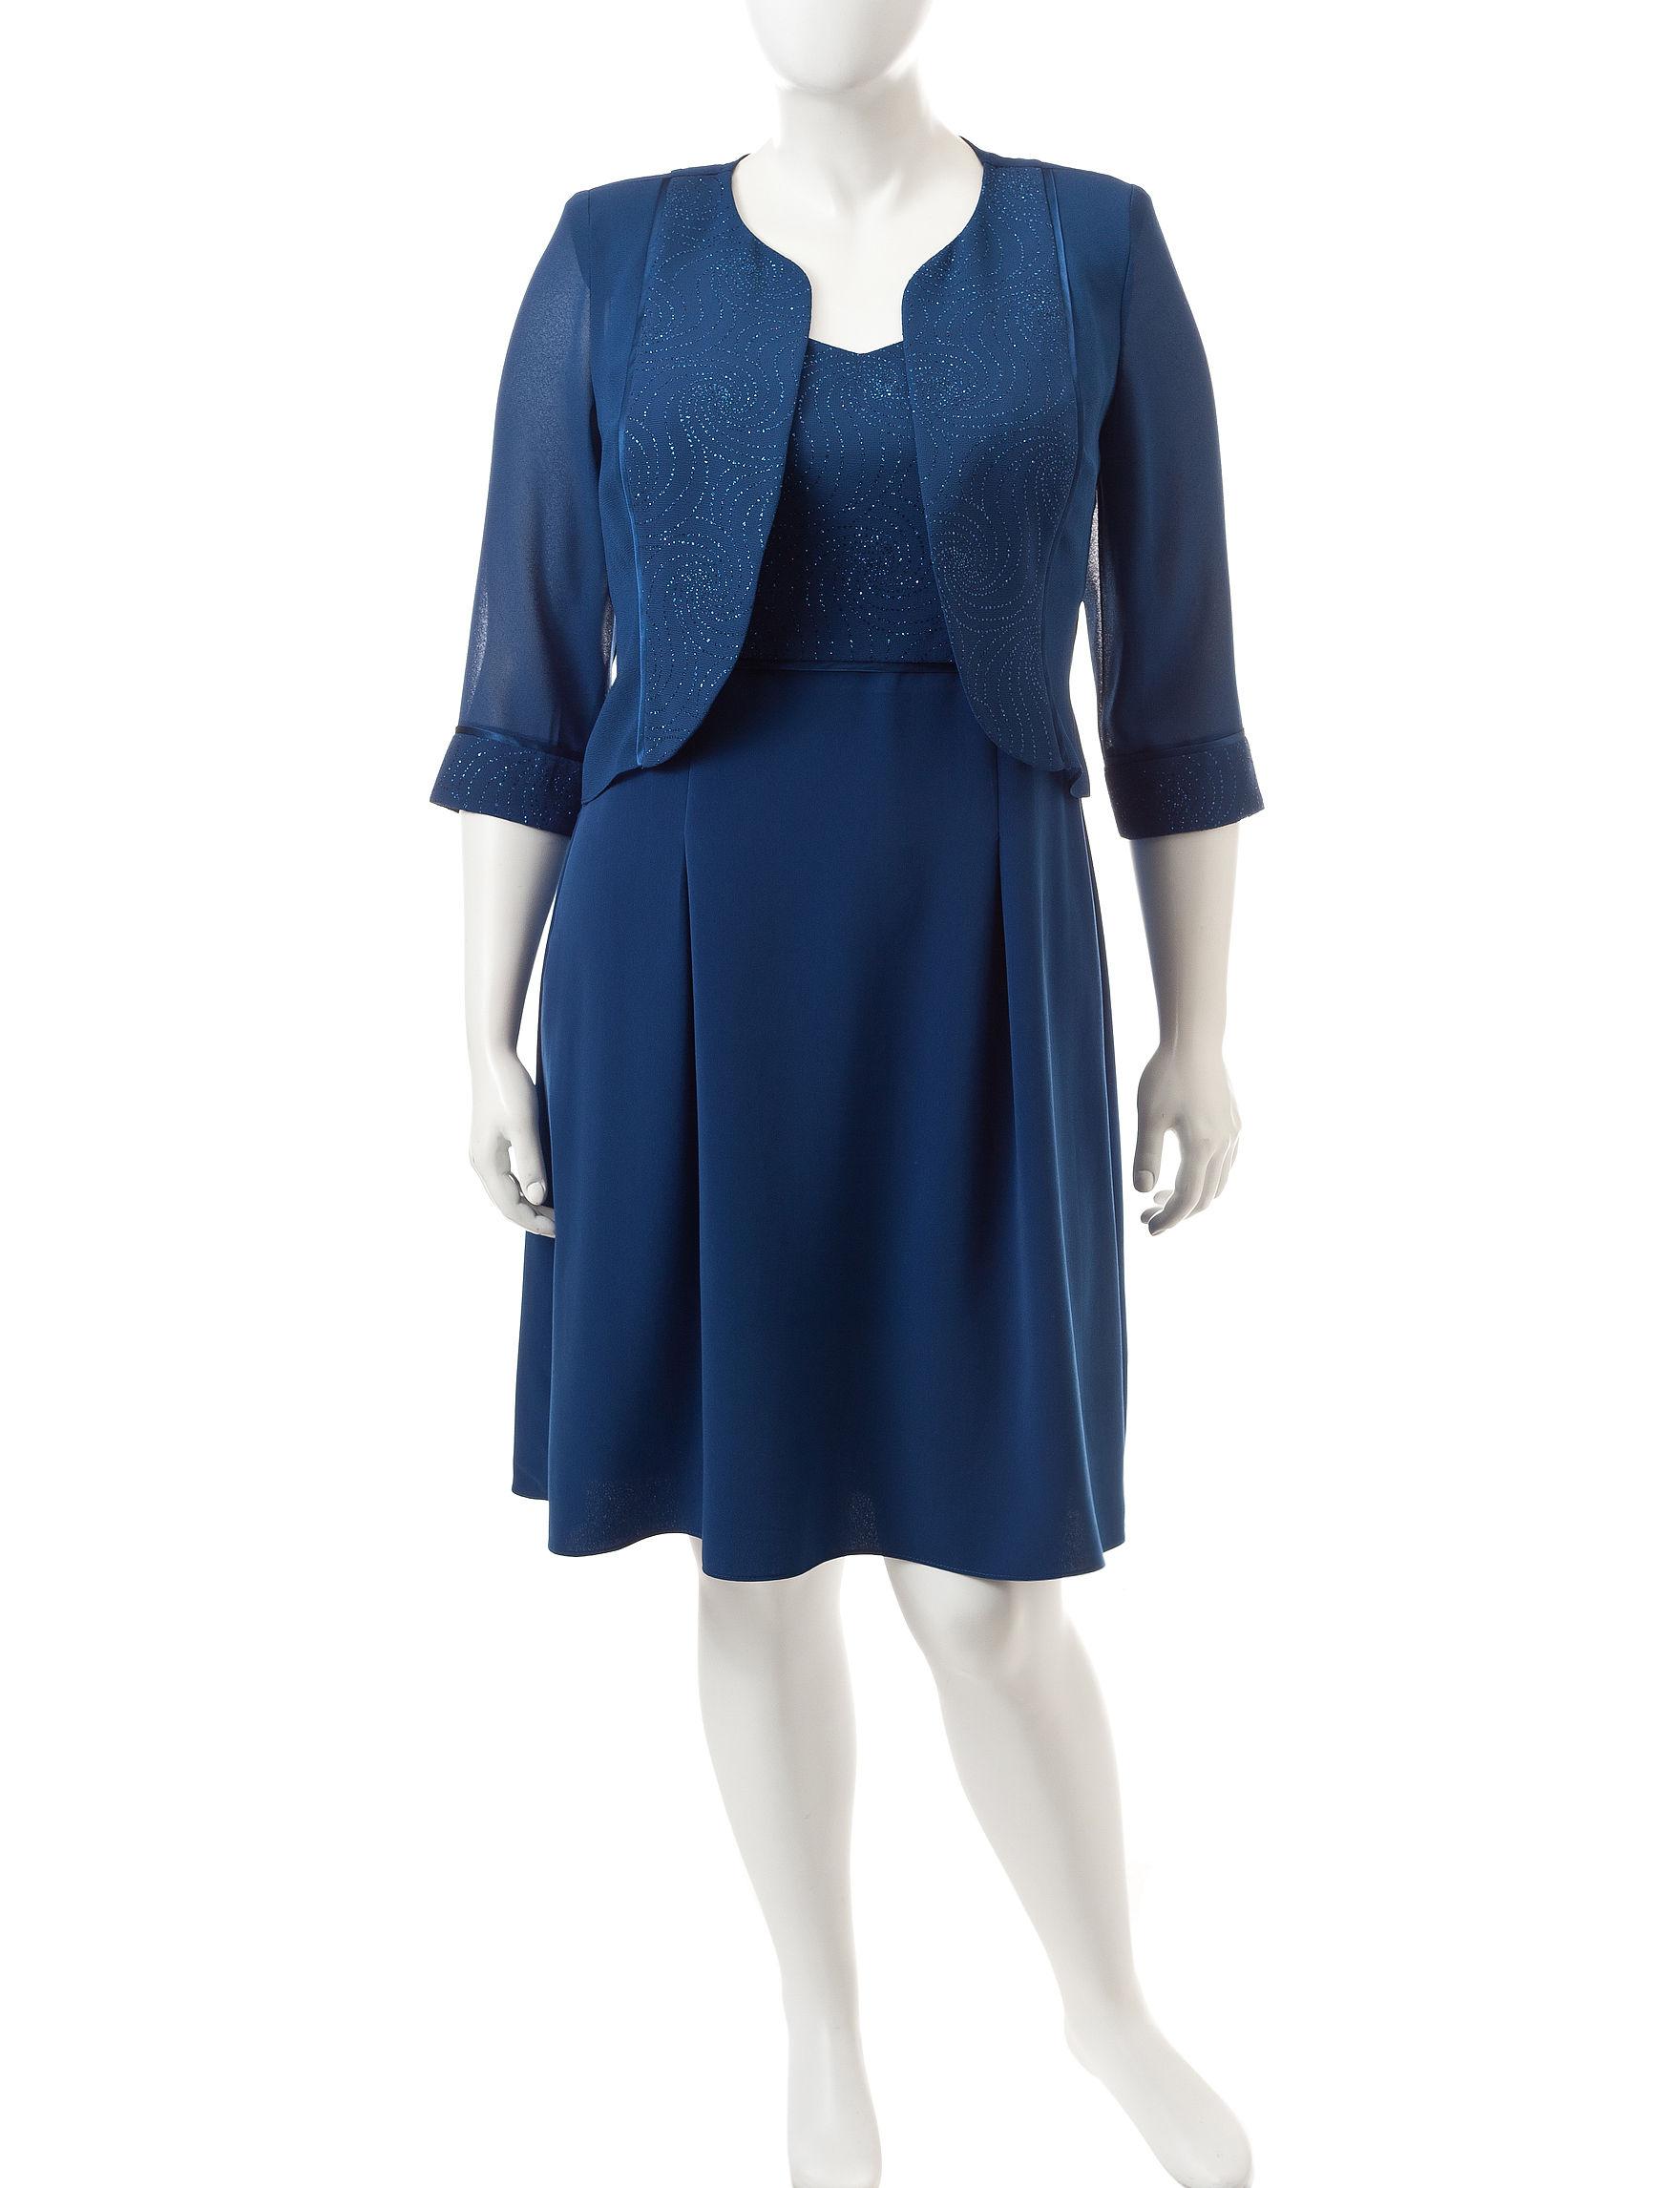 Dana Kay Blue Jacket Dresses